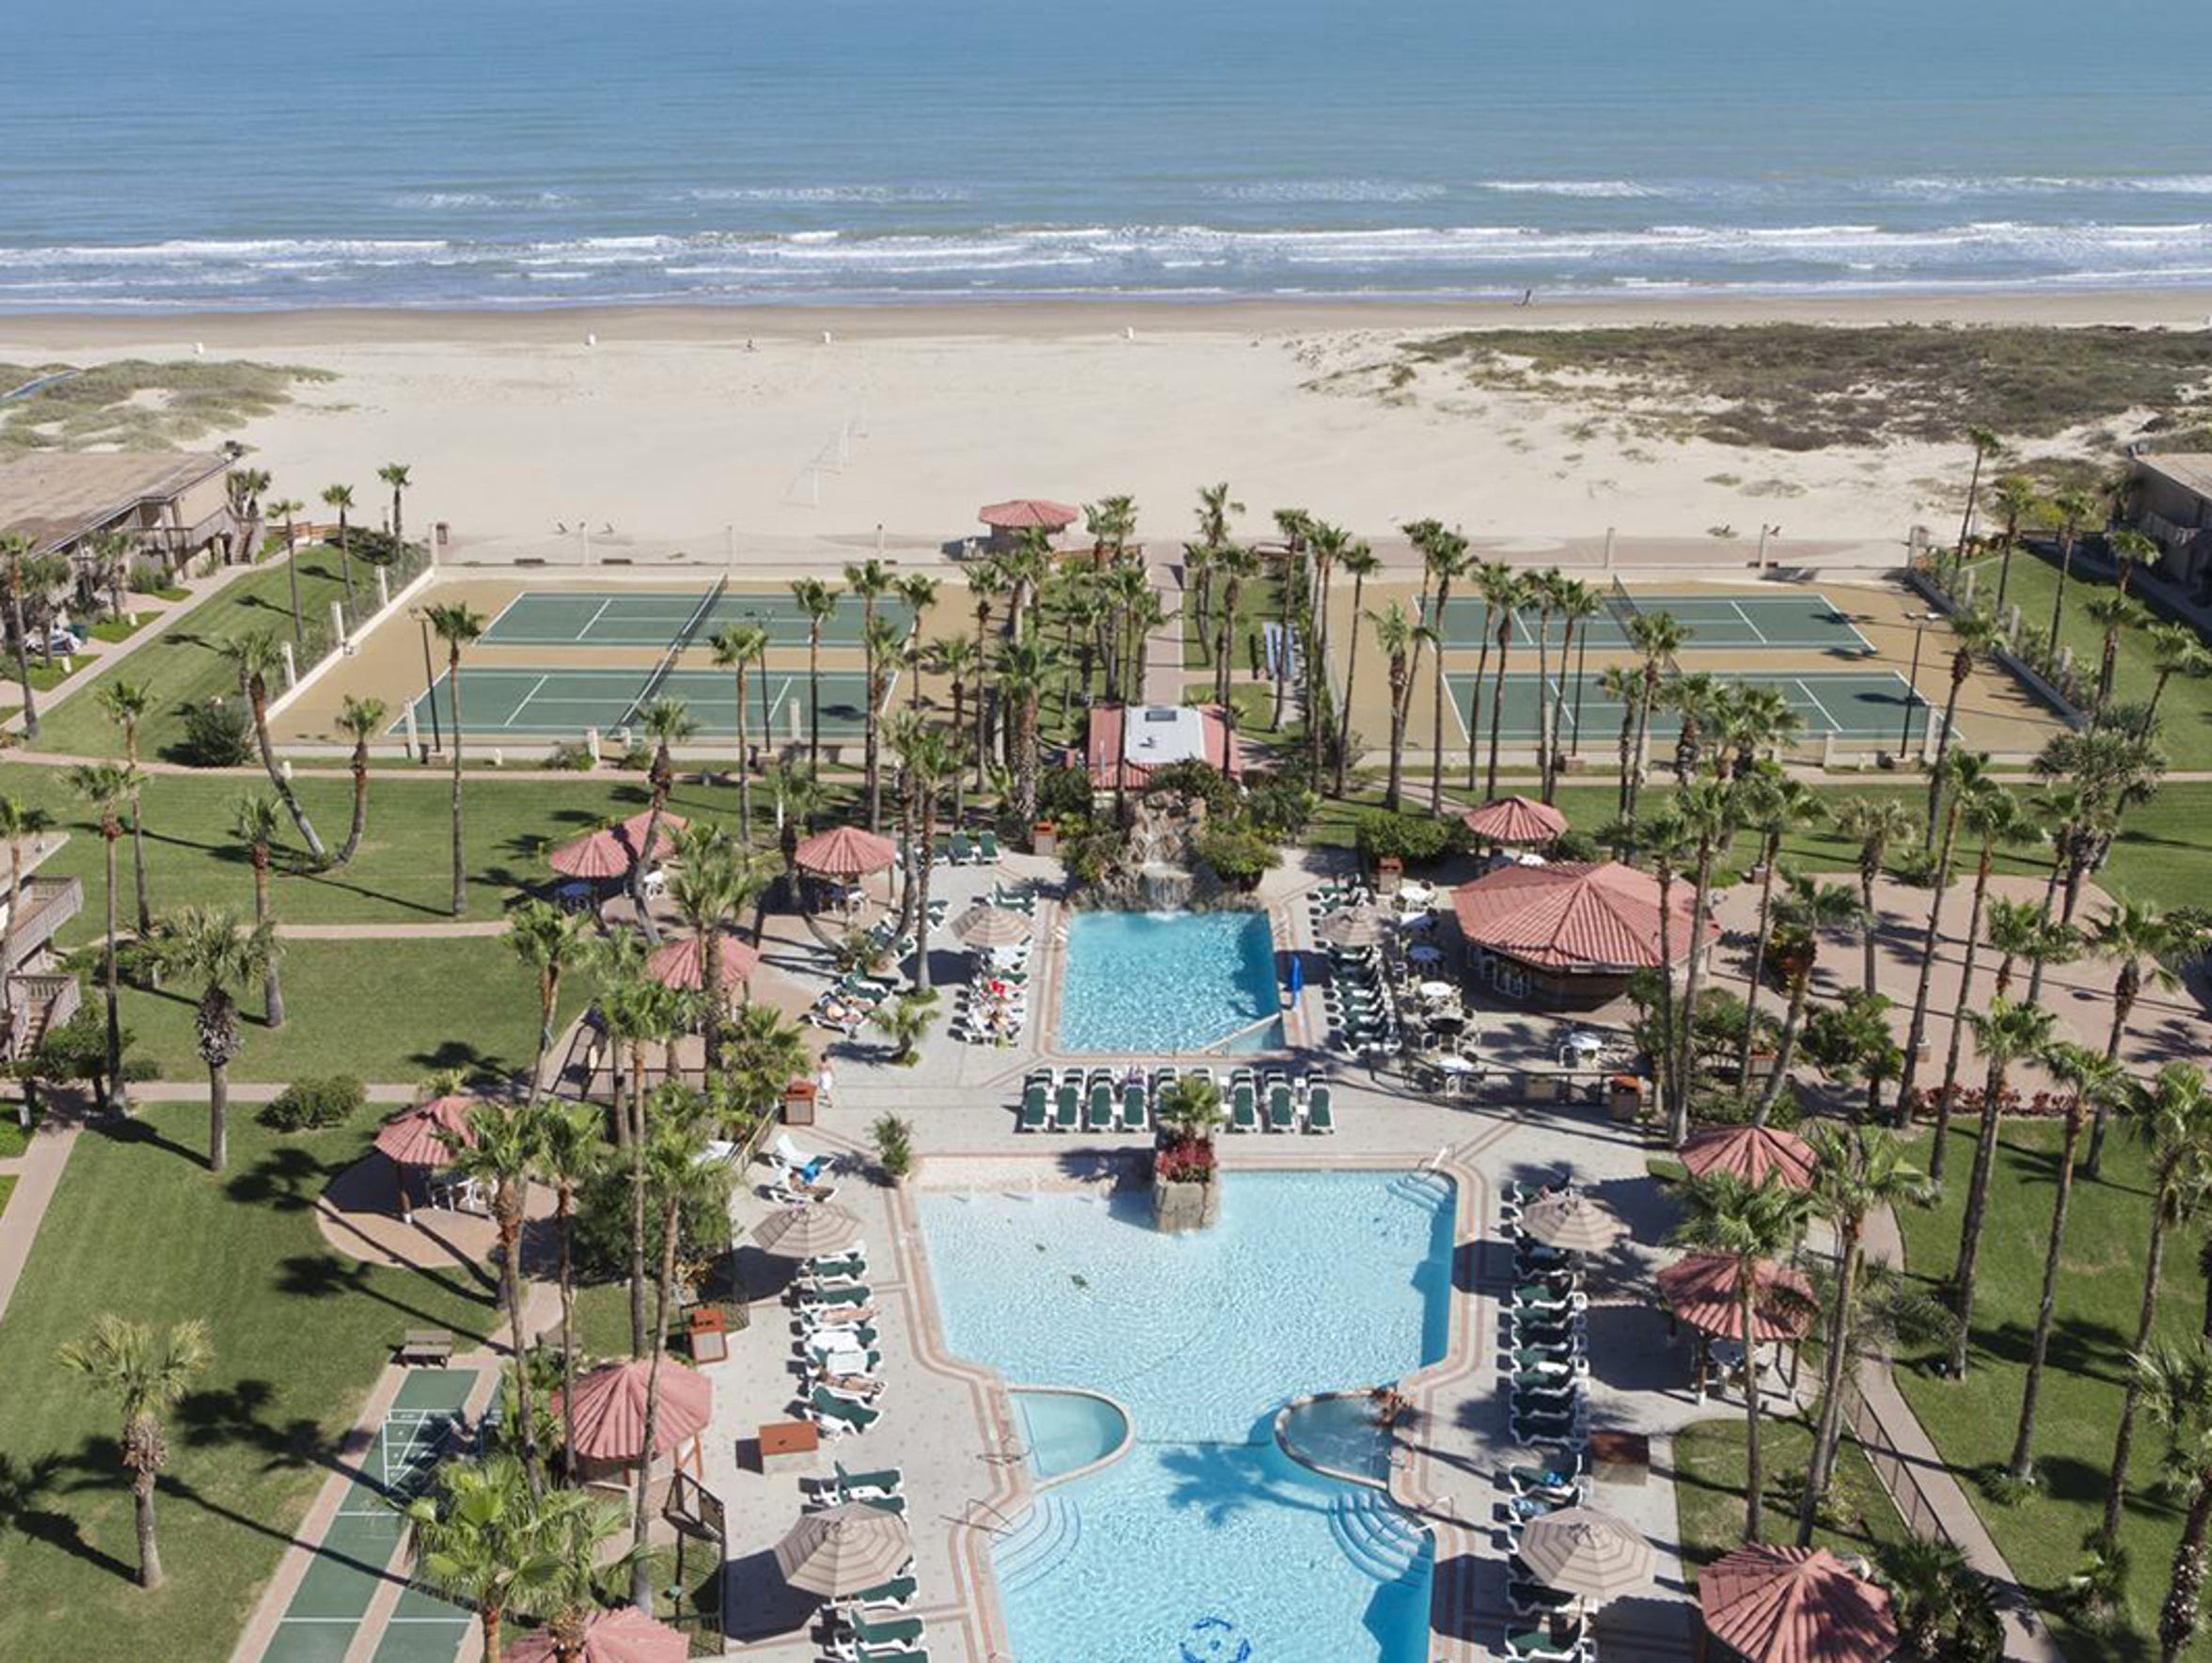 The Isla Grand Beach Resort South Padre Island, formerly